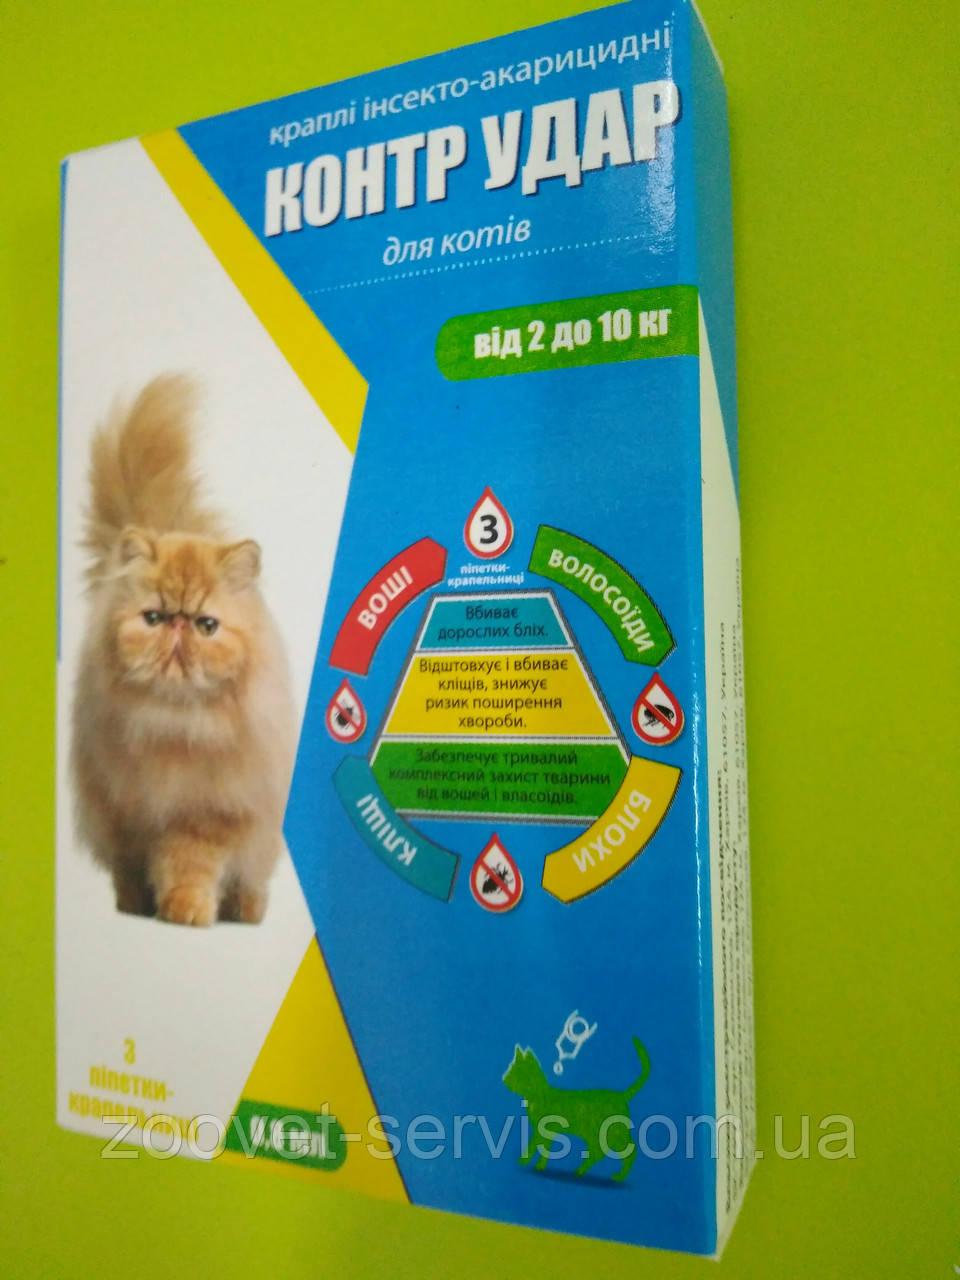 Капли от блохдля котов 2-10 кгКонтр Удар 0,8мл, упаковка 3 пипетки